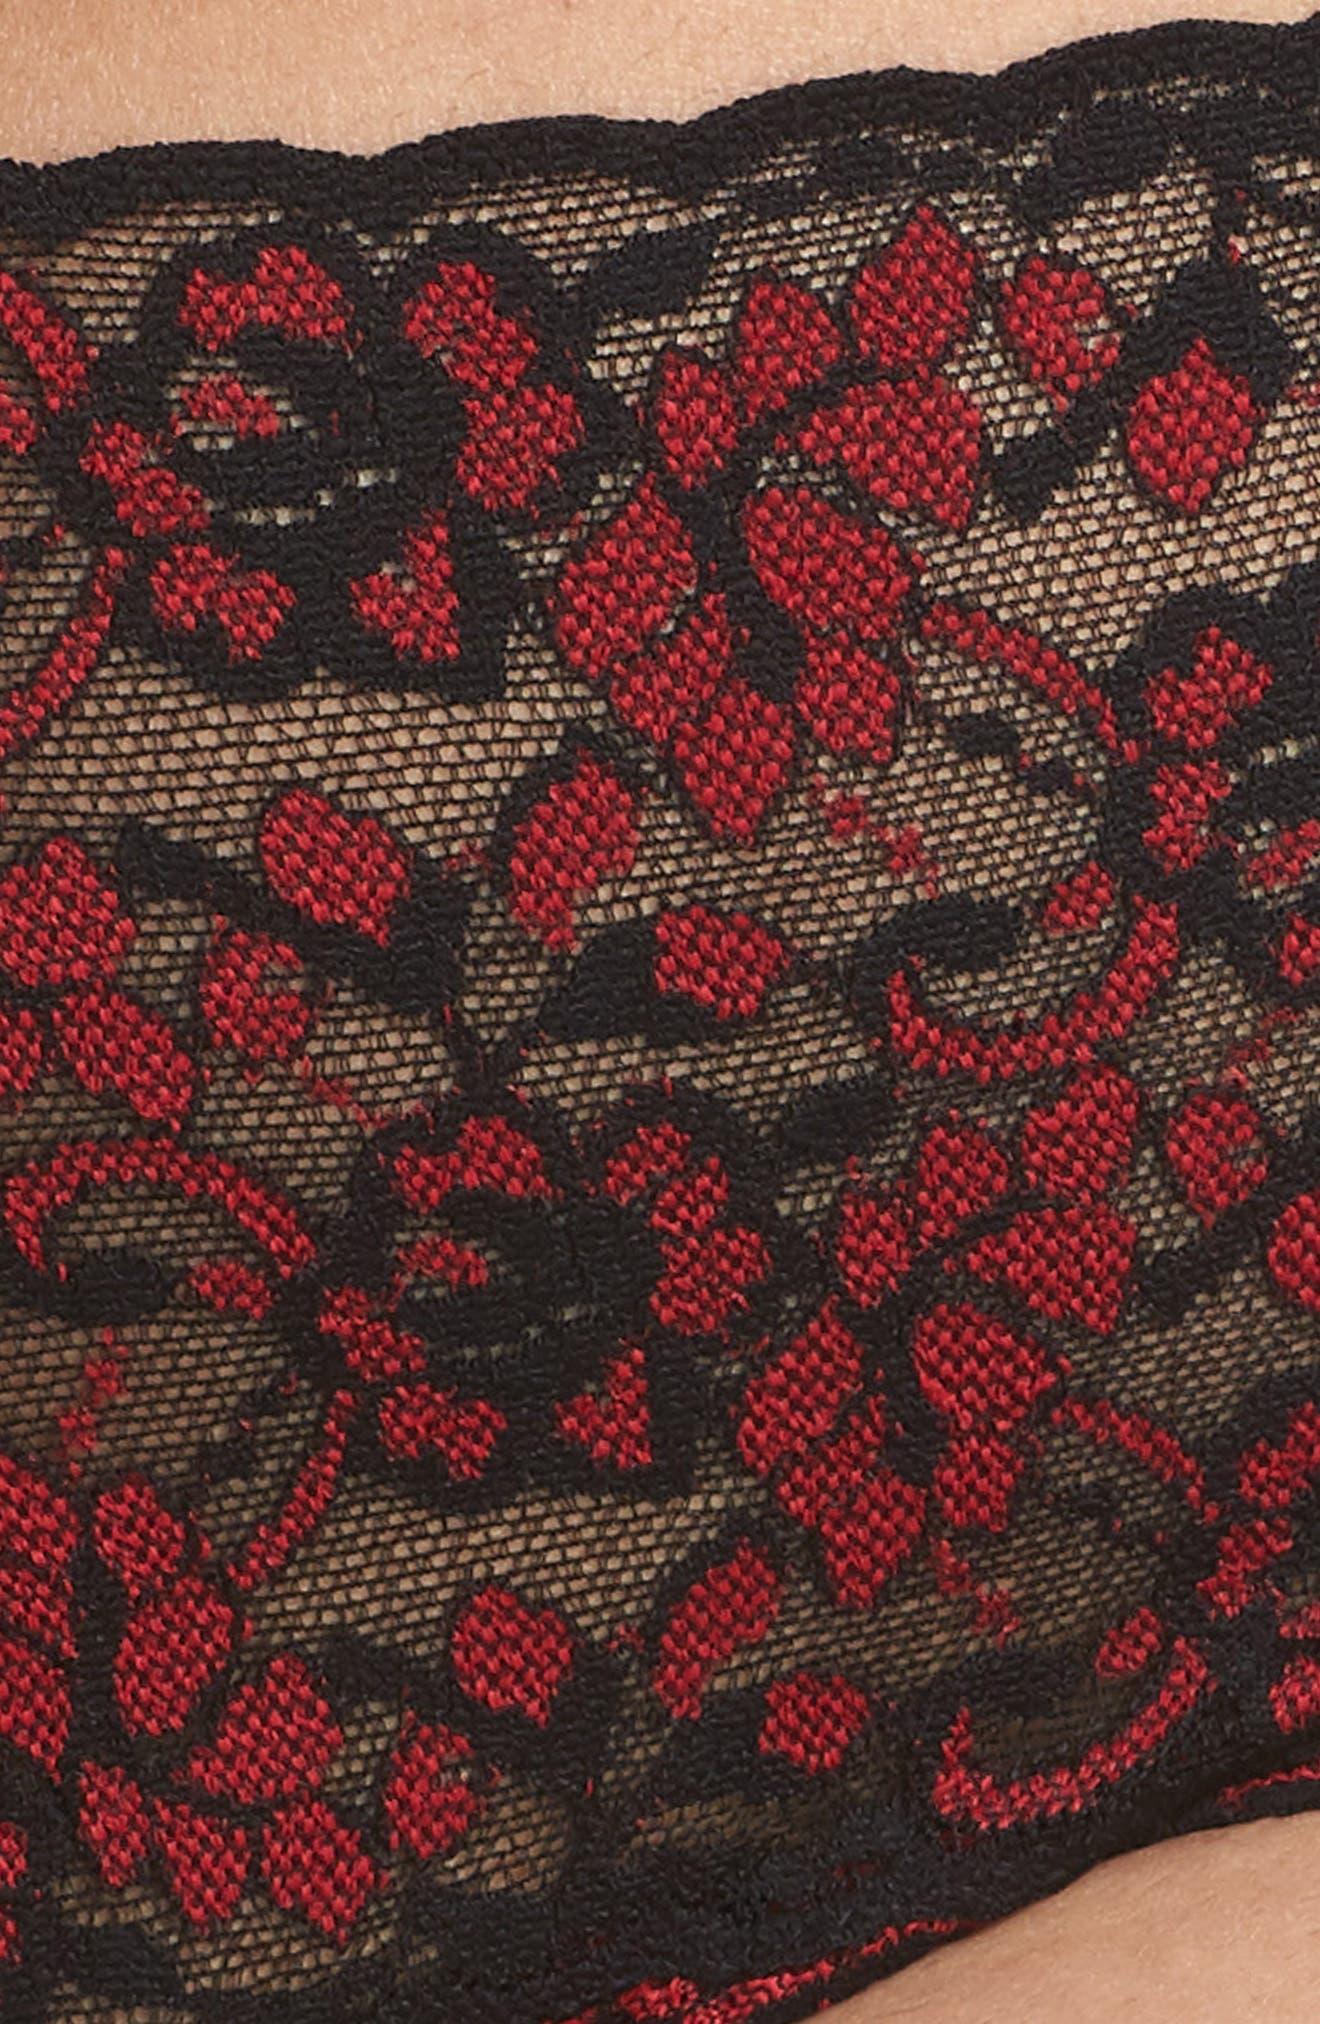 Cross Dye Lace Retro Thong,                             Alternate thumbnail 5, color,                             BLACK/ RED